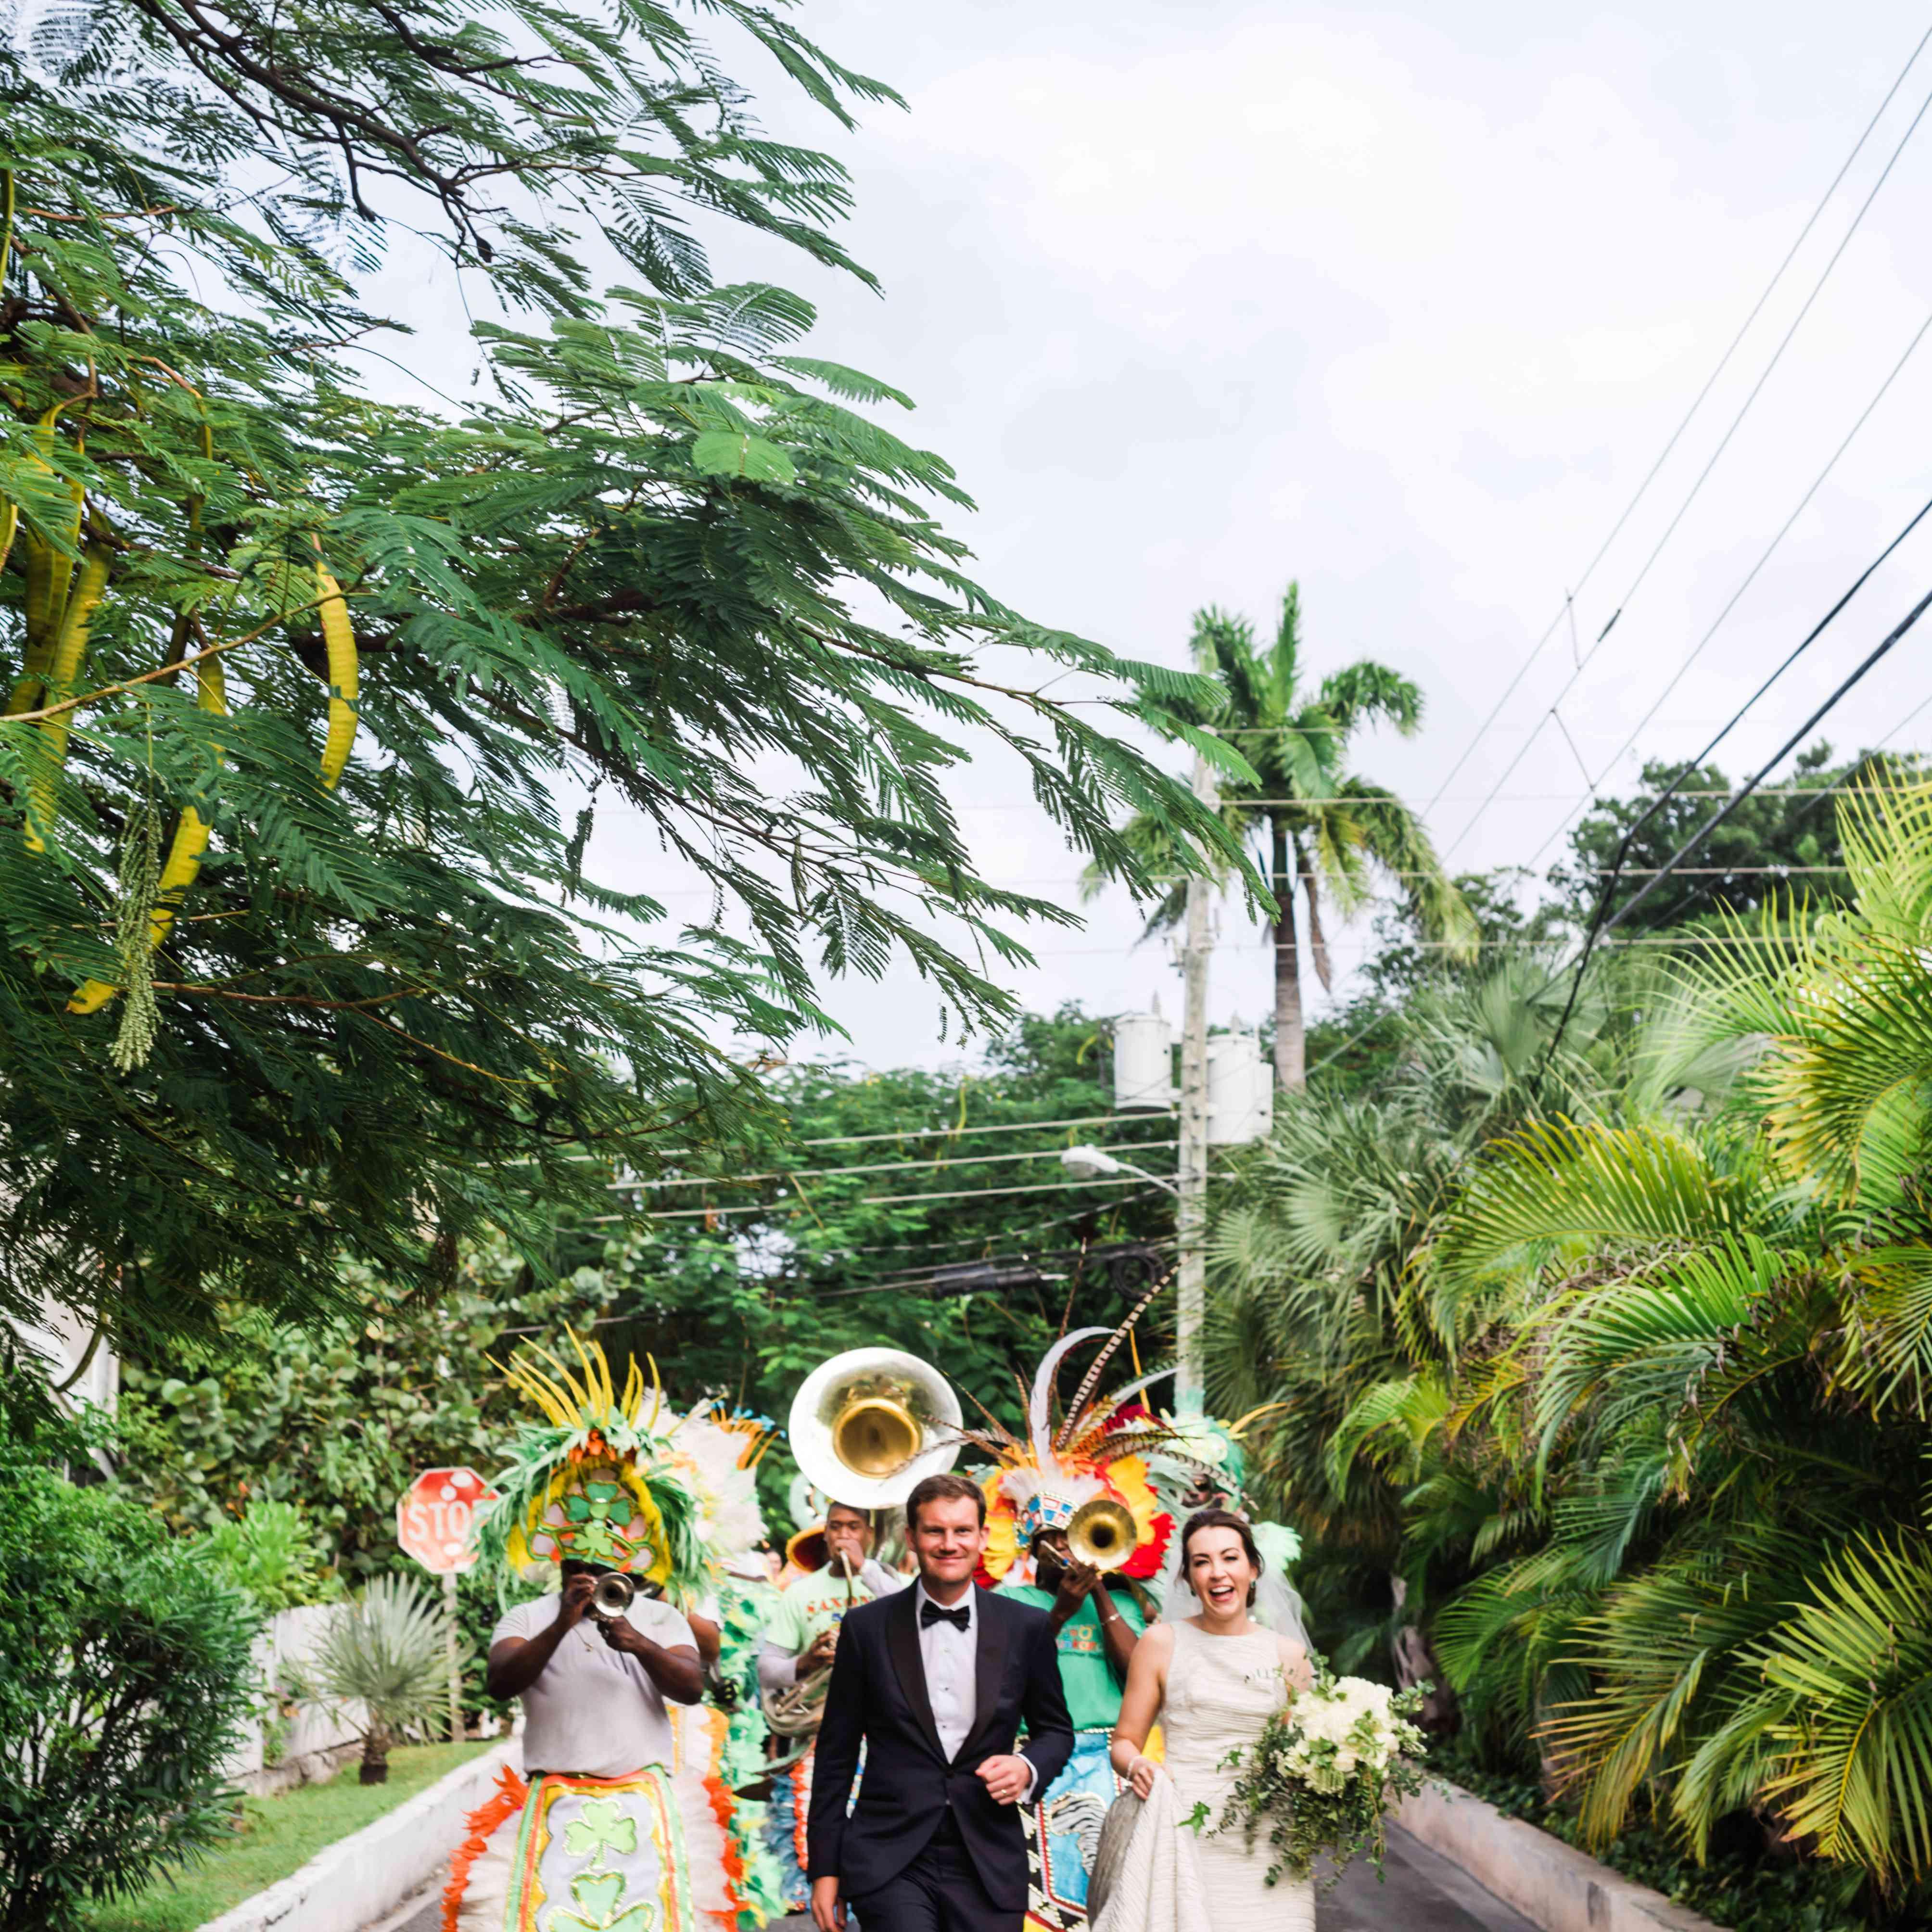 <p>bride and groom bahamas parade</p><br><br>